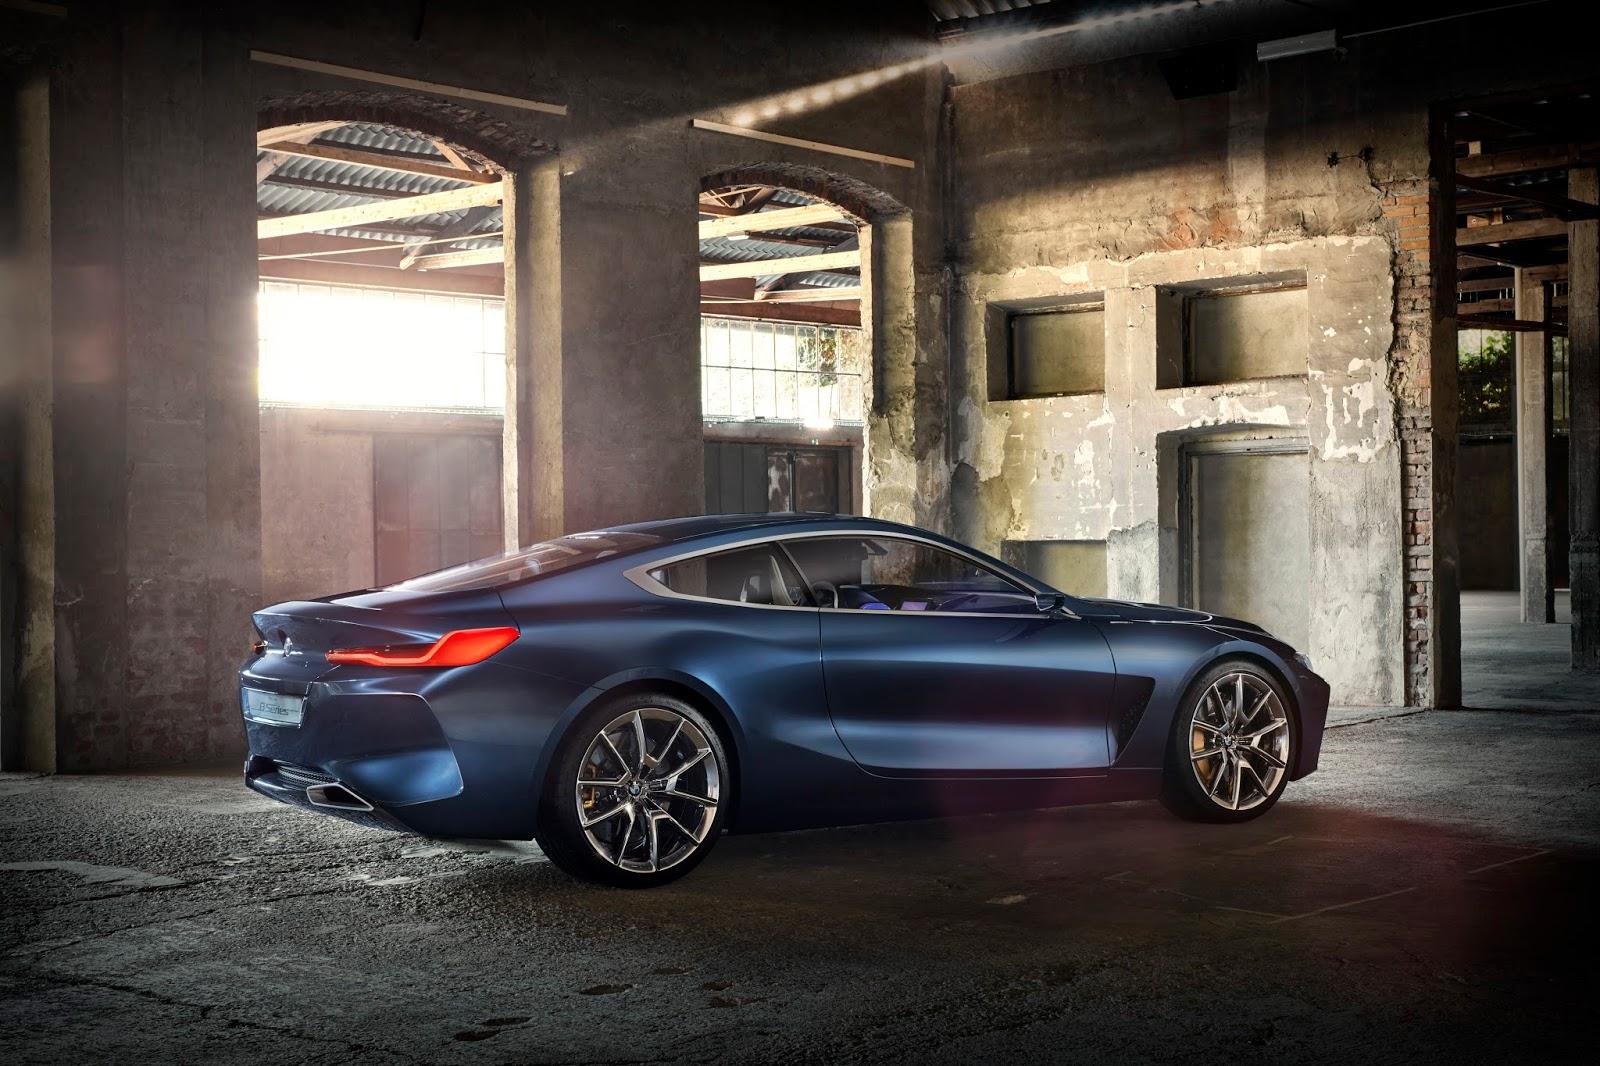 P90261126 highRes bmw concept 8 series Η BMW Σειρά 8 Coupe είναι η πεμπτουσία των μελλοντικών σπορ αυτοκινήτων BMW, BMW 8, BMW Concept, BMW Concept 8 Series, COUPE, dream car